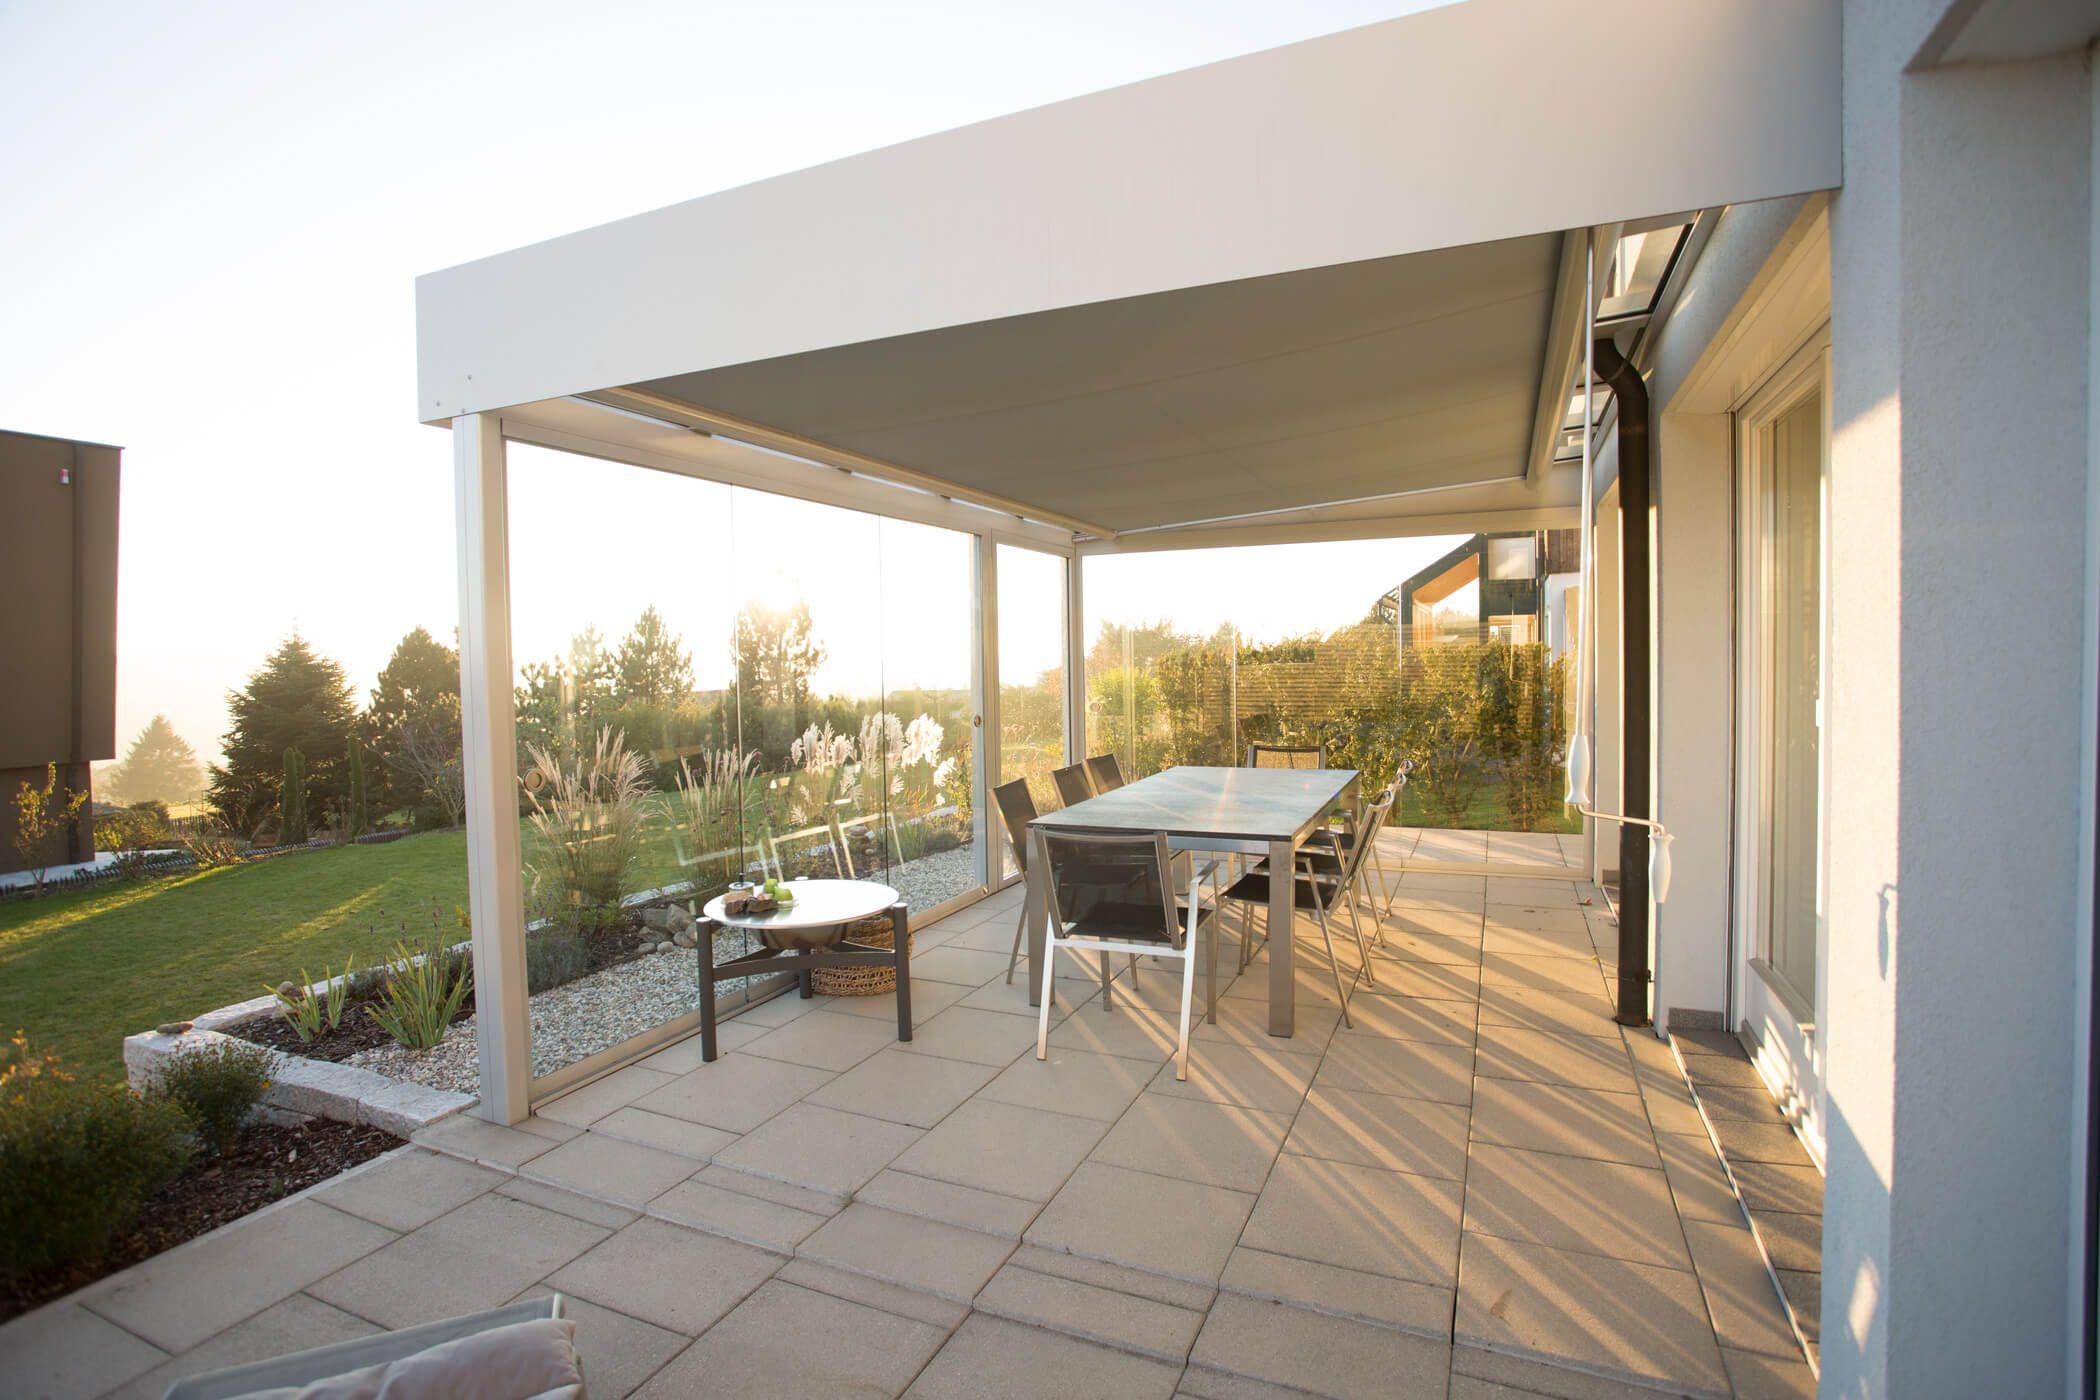 28 Ideen Fur Terrassengestaltung Dach: Terrassen Gestaltung